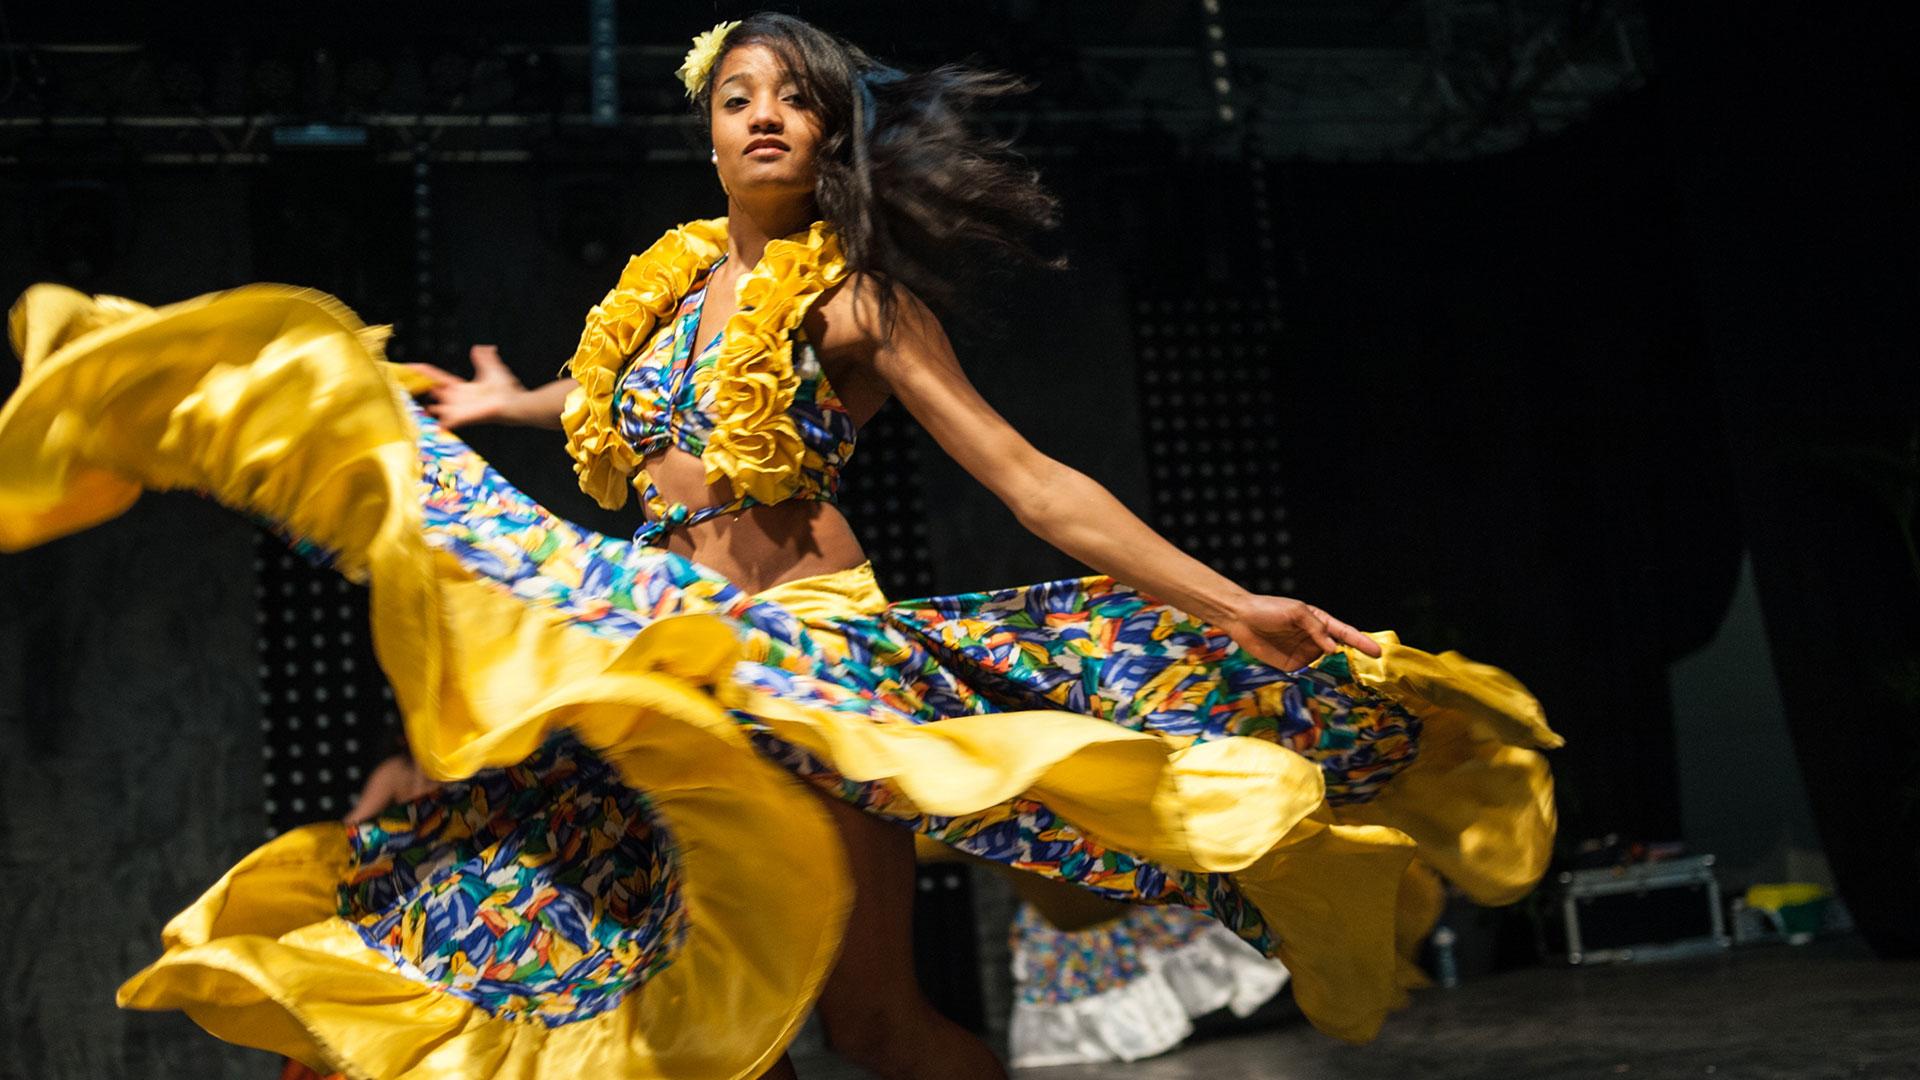 paulo-lobo-danseuse-festival-clae-2014